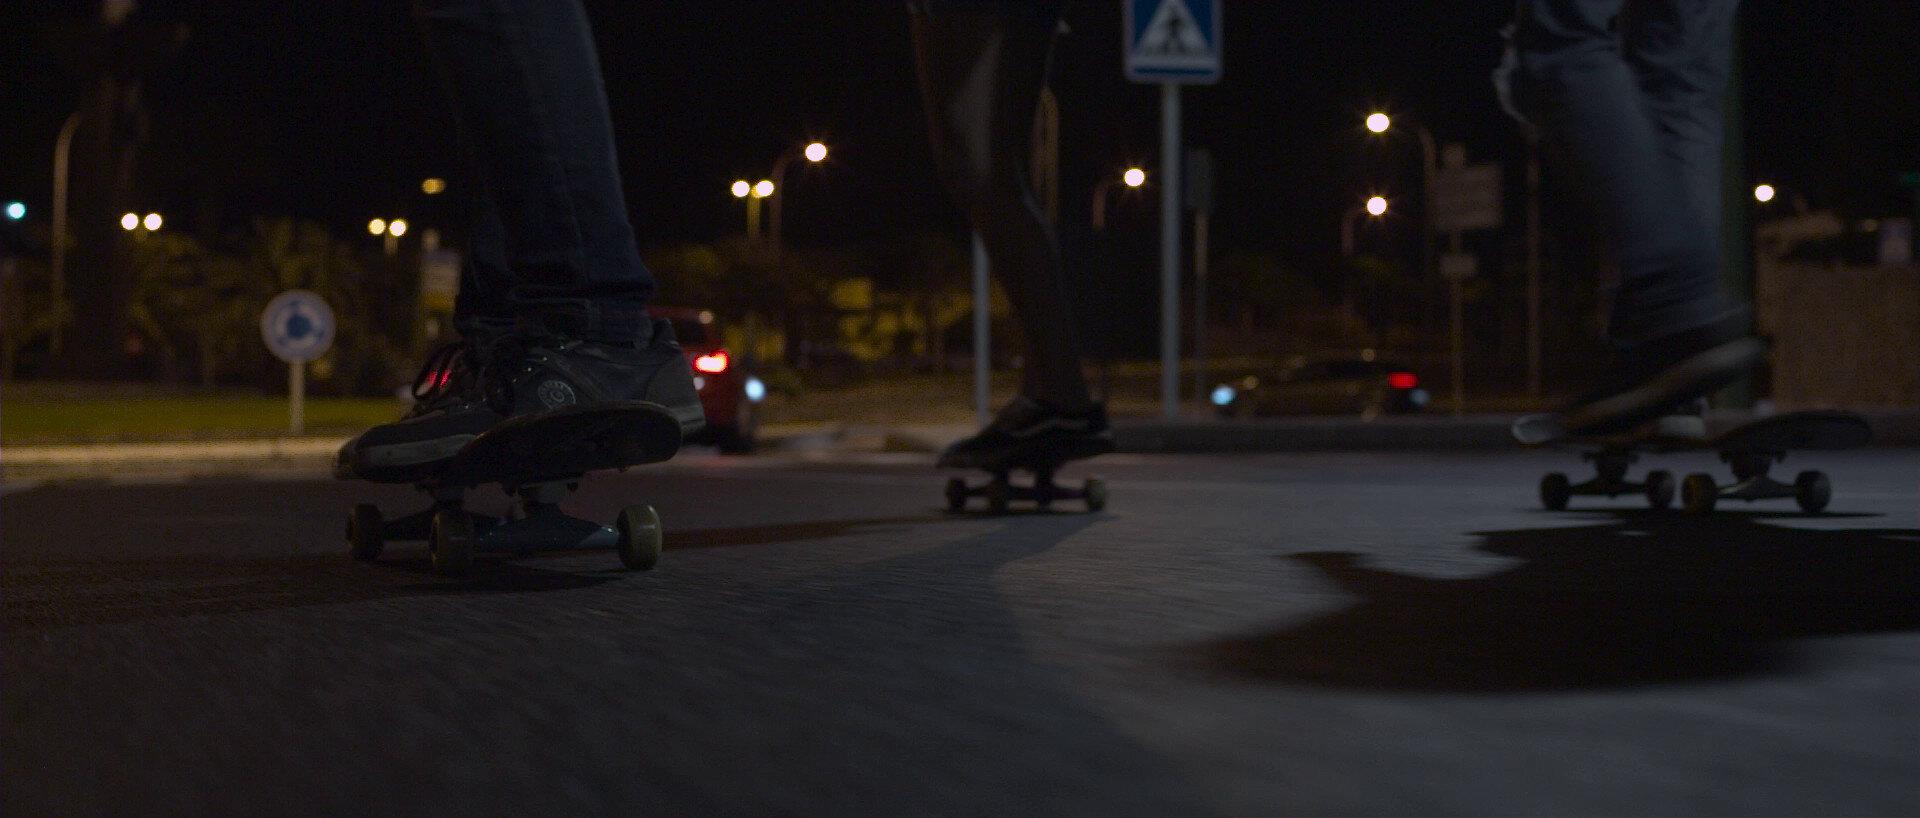 nightowls.jpg